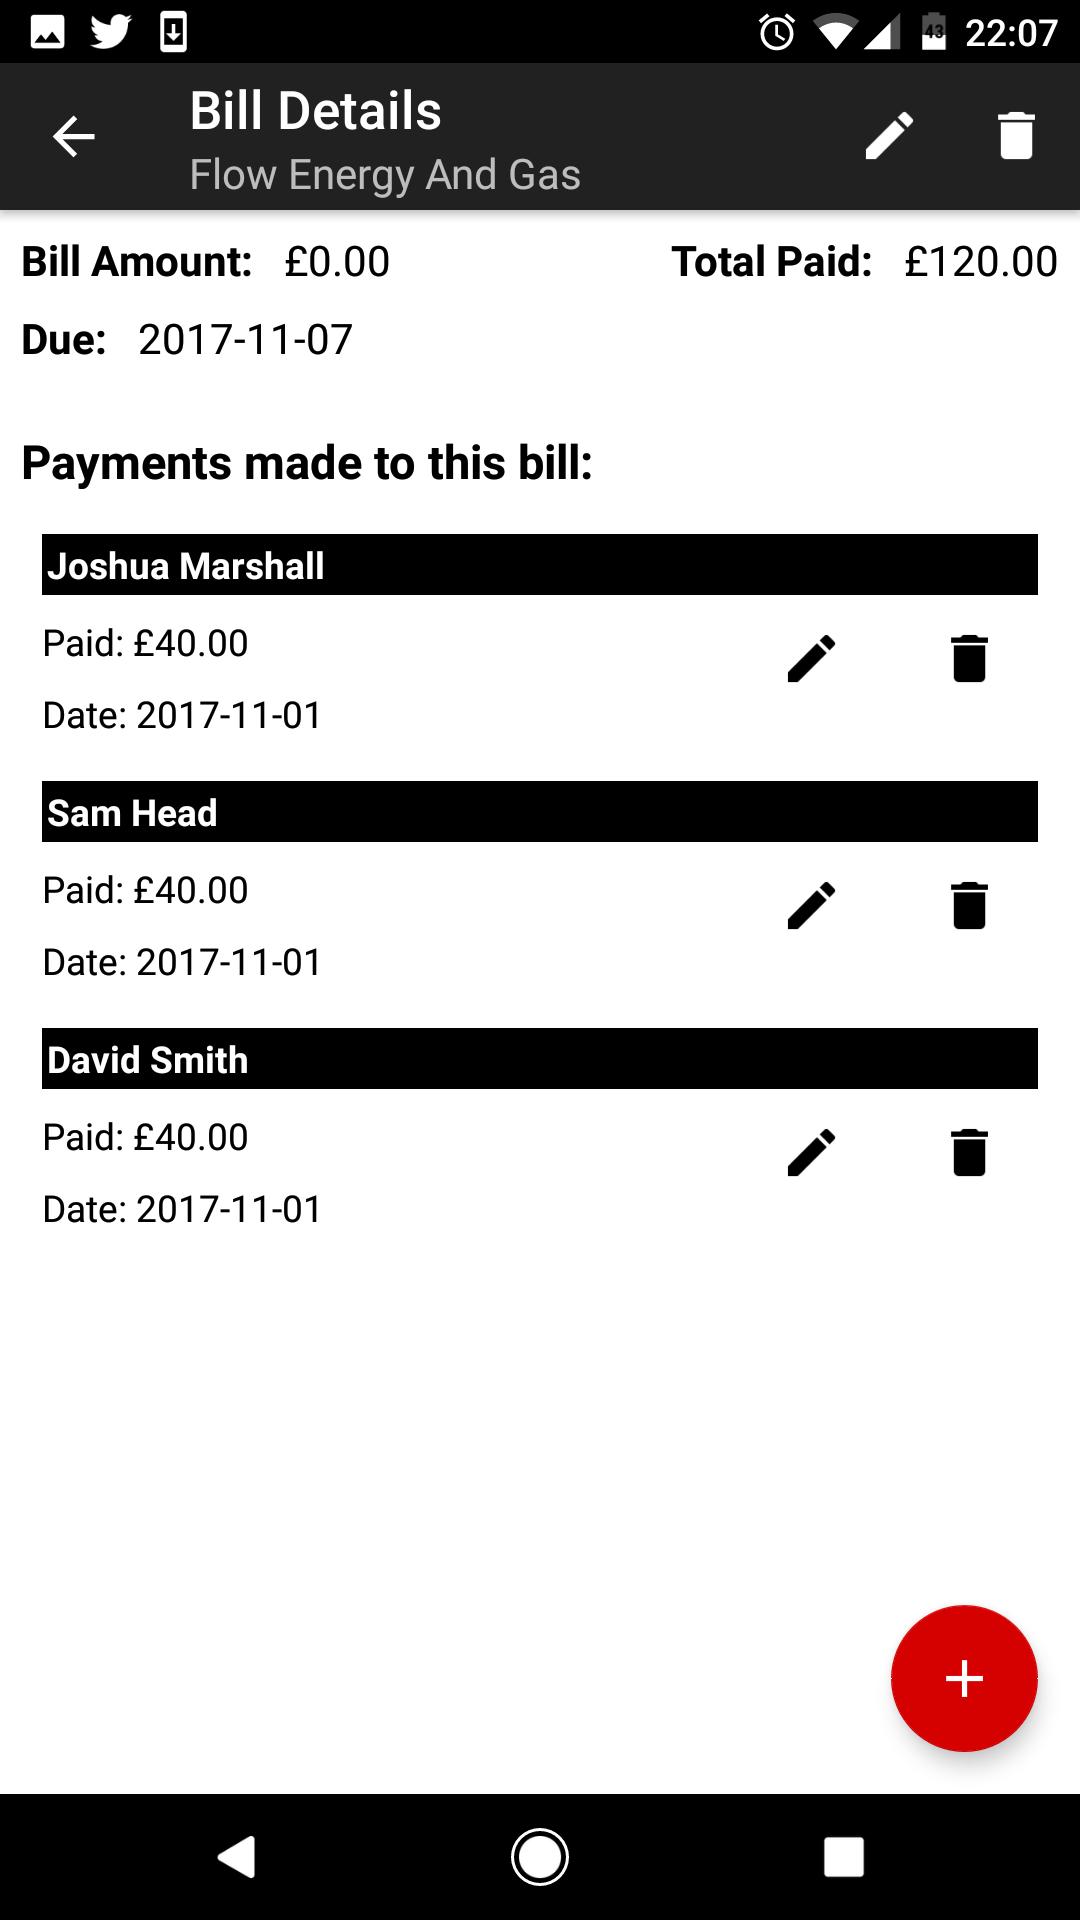 Bill Details